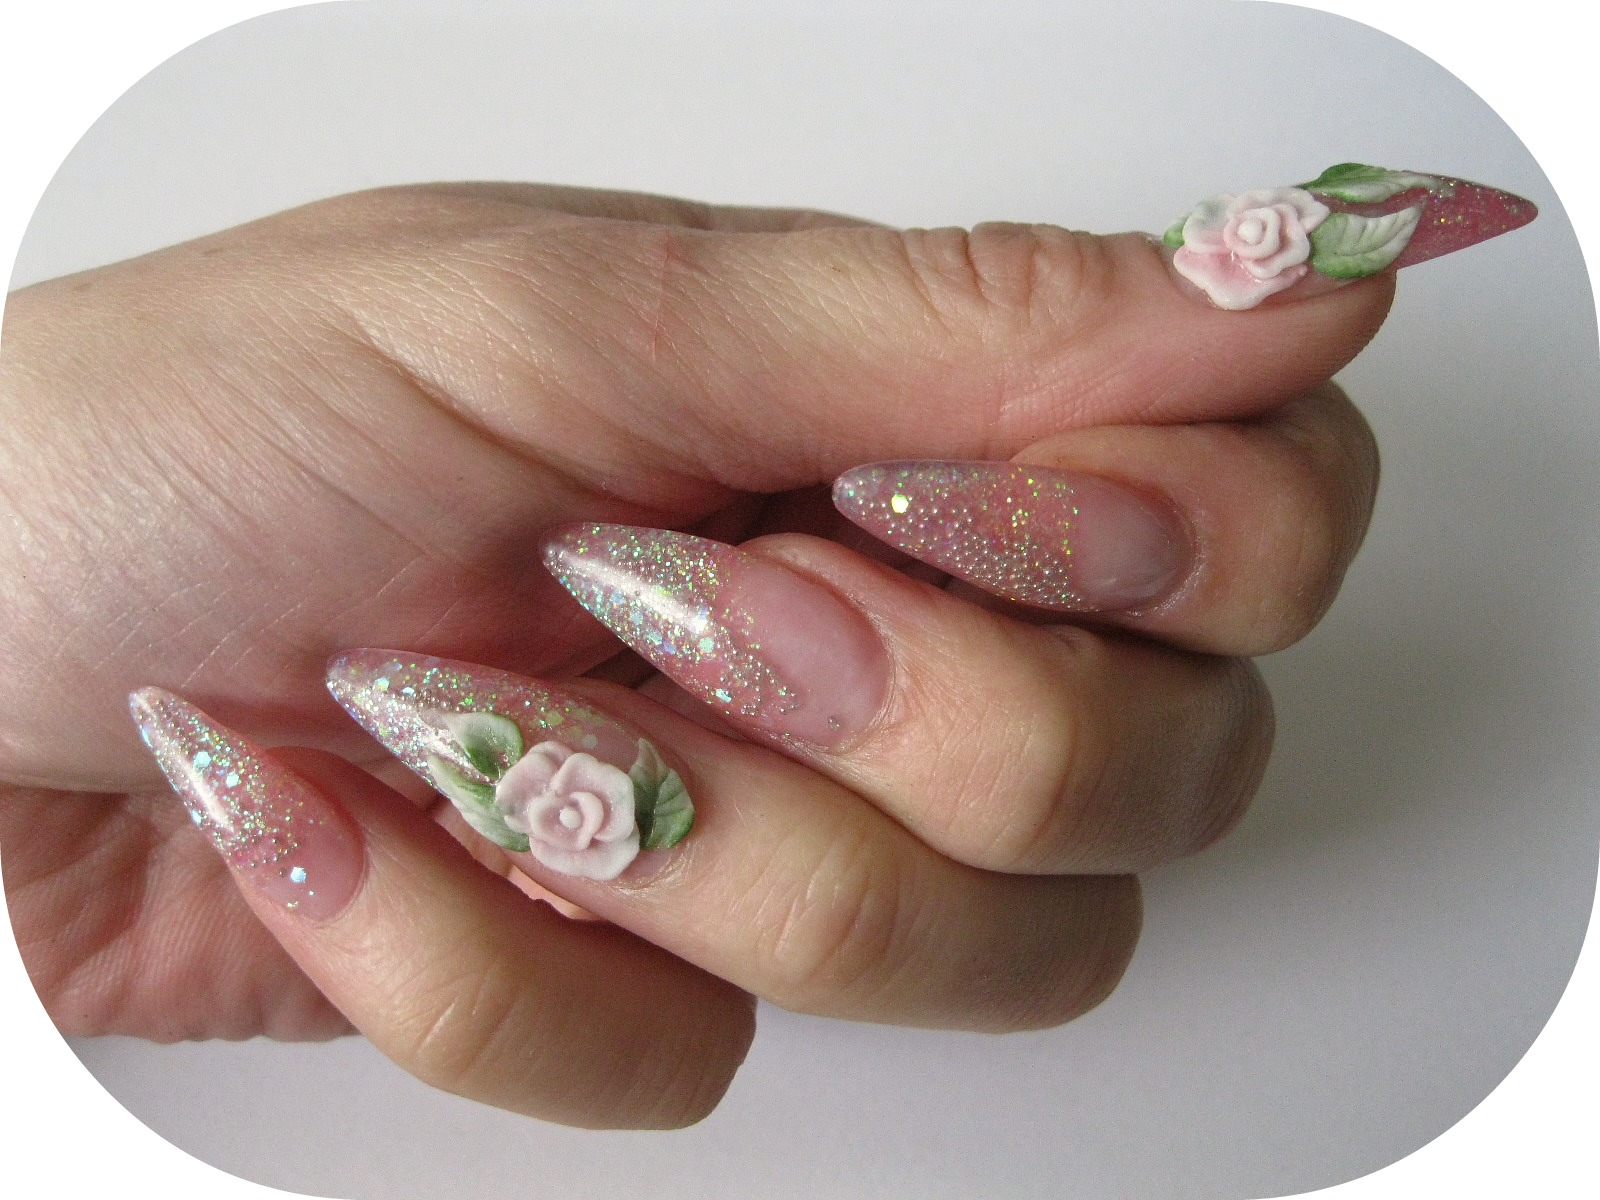 stiletto nails 3d acrylic roses photo - 1